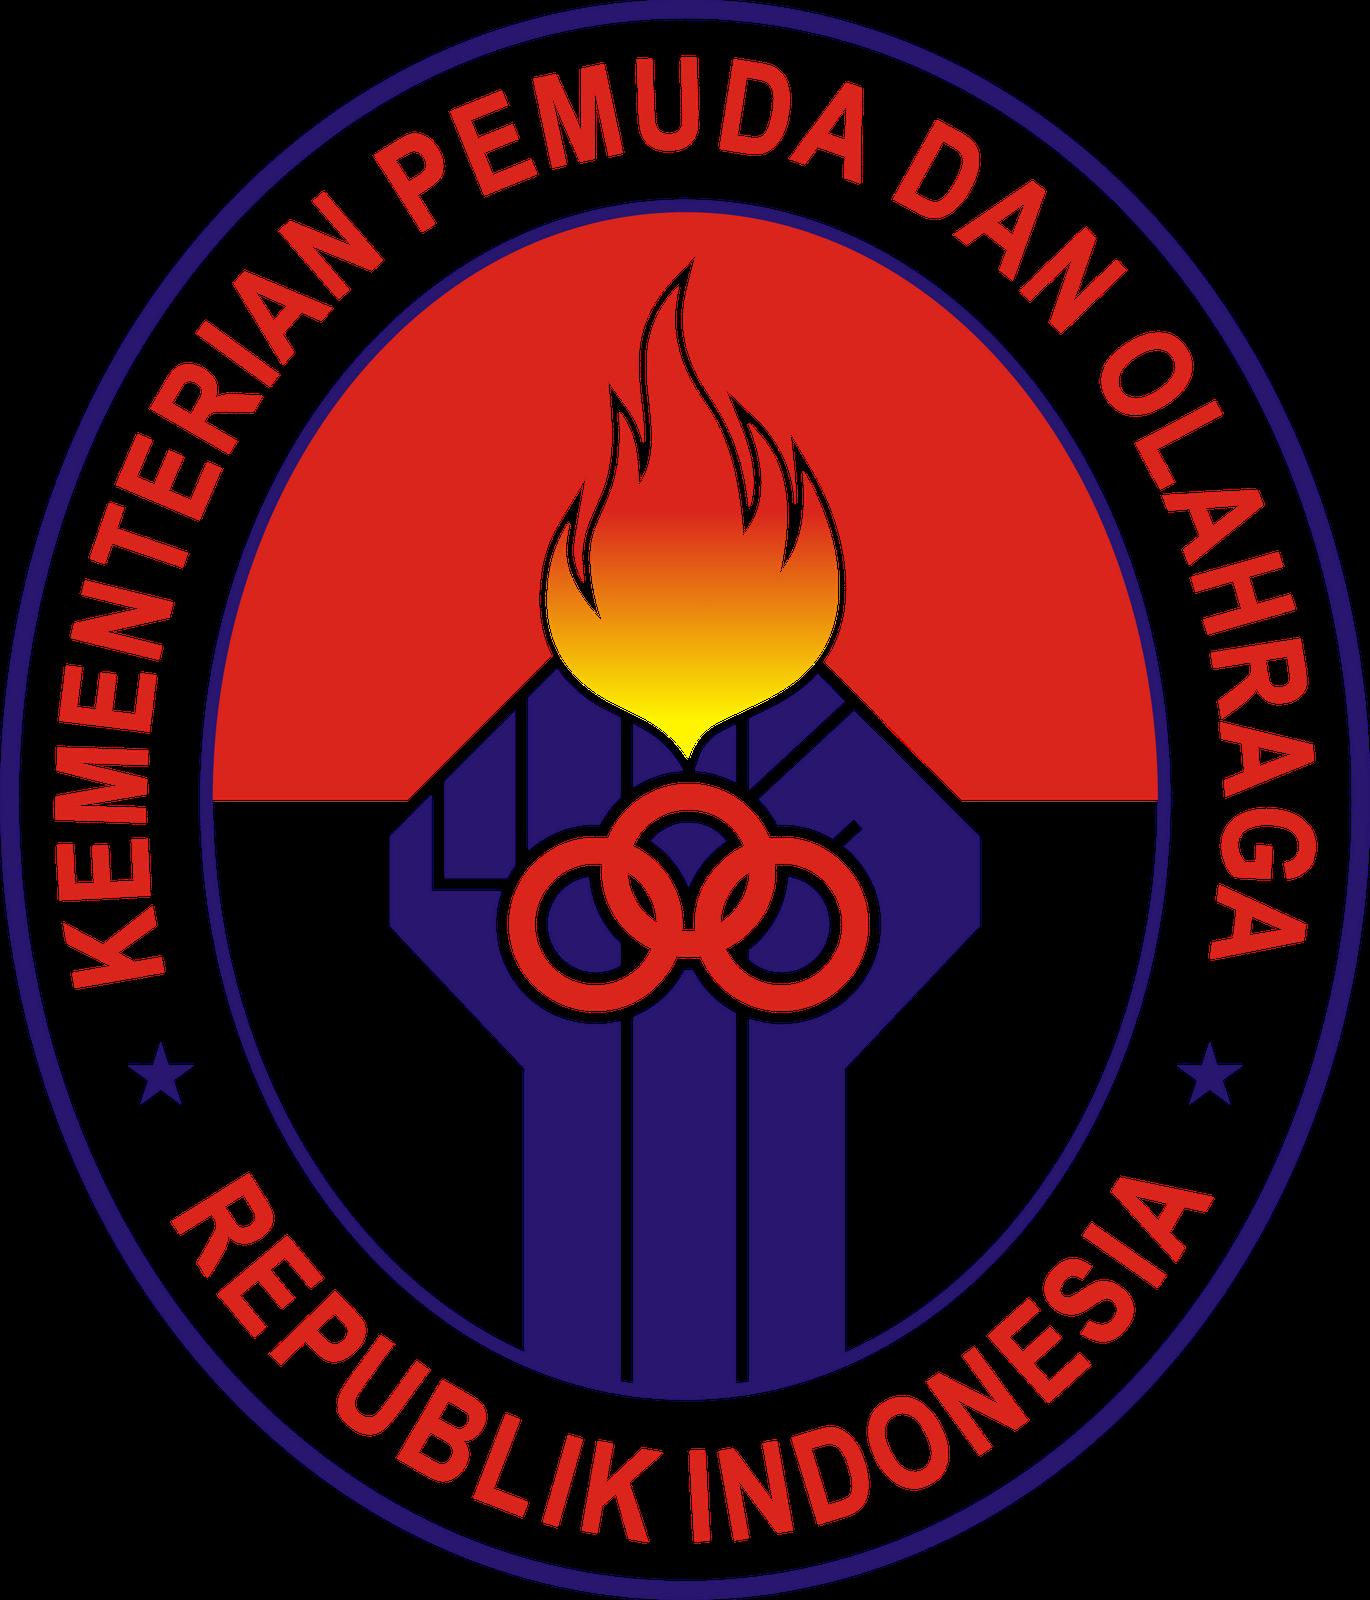 Logo Kementerian di Indonesia - Kumpulan Logo Indonesia